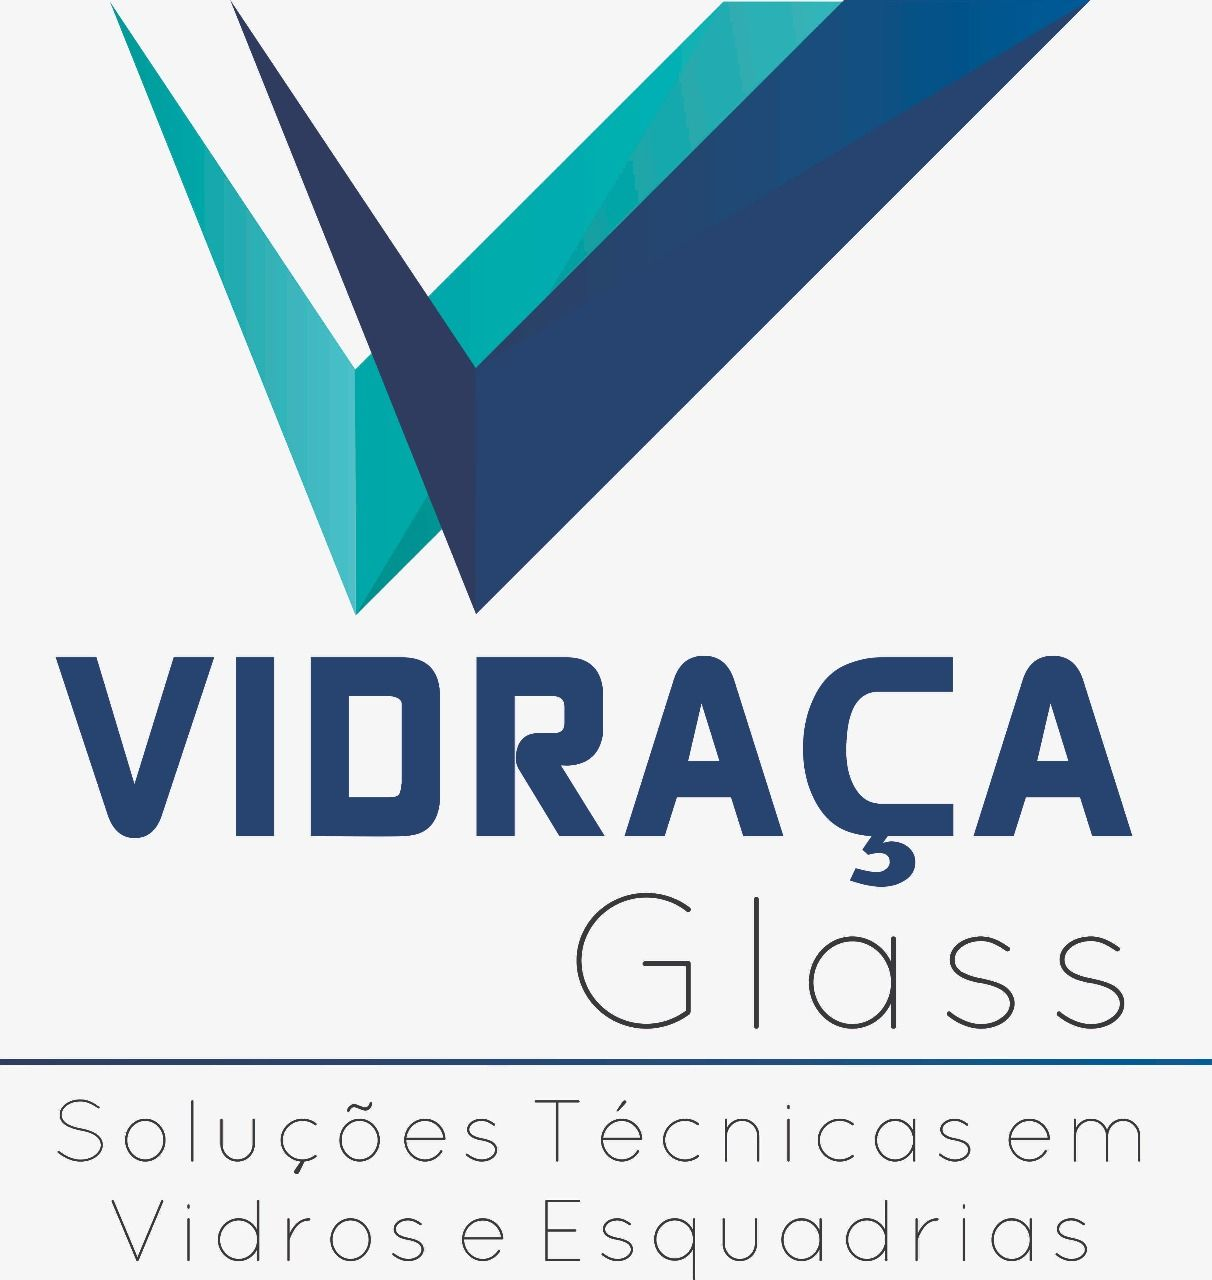 Vidraça Glass em Bertioga